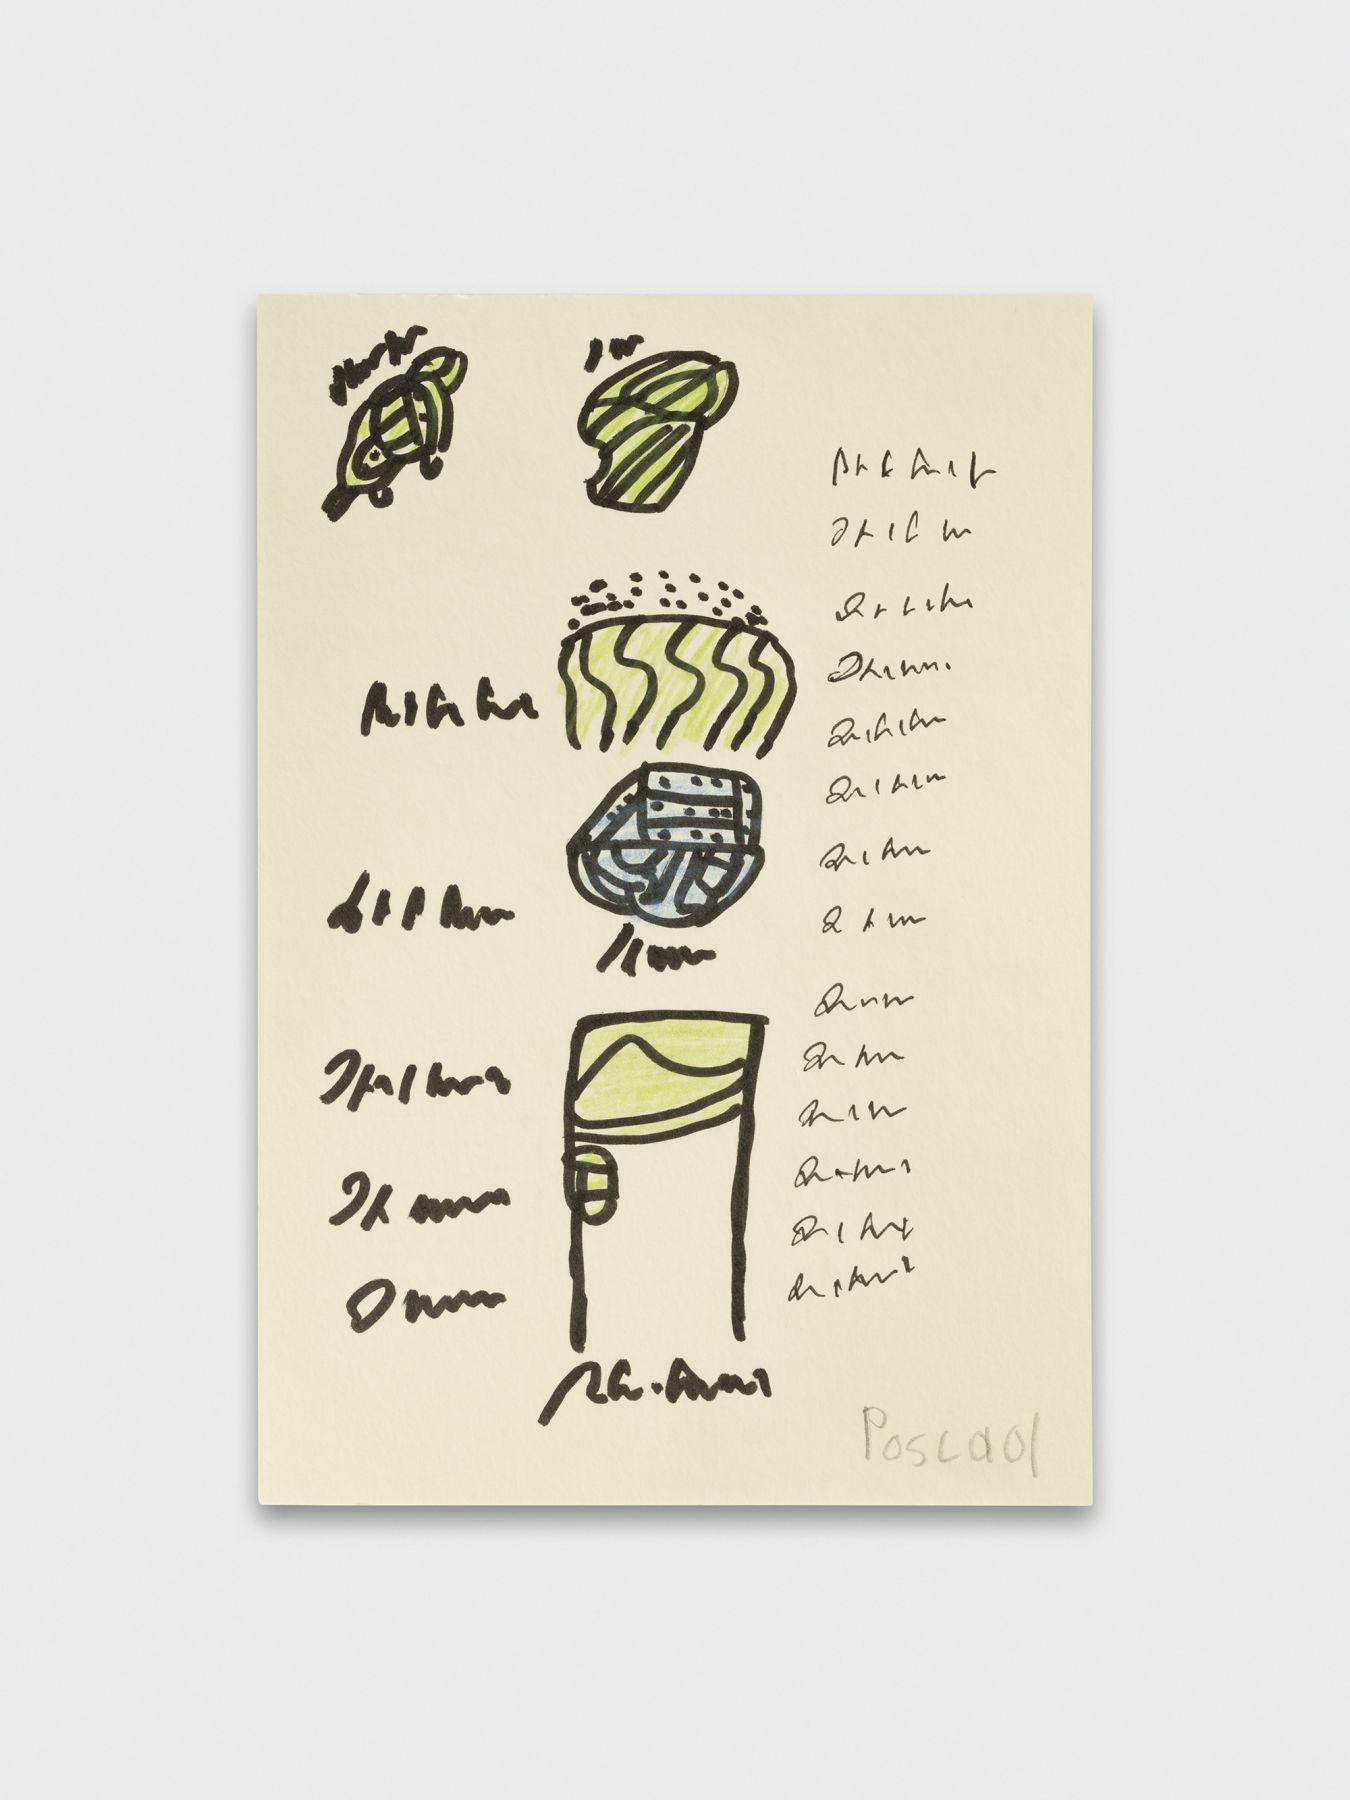 Pascal Vonlanthen I_une porte, 2021  Acrylic markers and pencil on paper 21,5 x 14,7 cm Image © Julien Gremaud